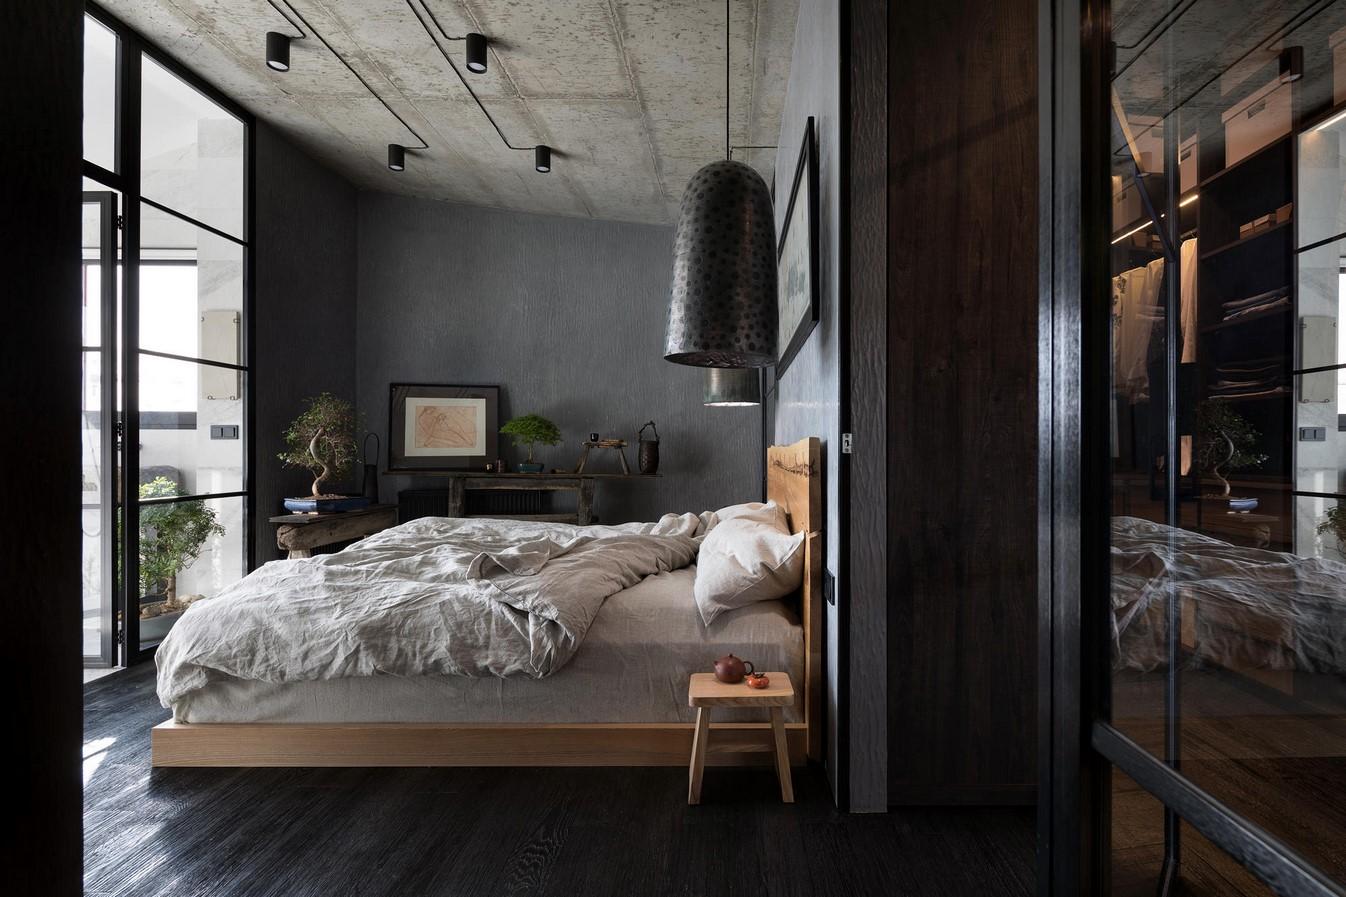 Wabi Sabi Apartment by Sergey Makhno in Kiev: Perfectly Imperfect - Sheet2